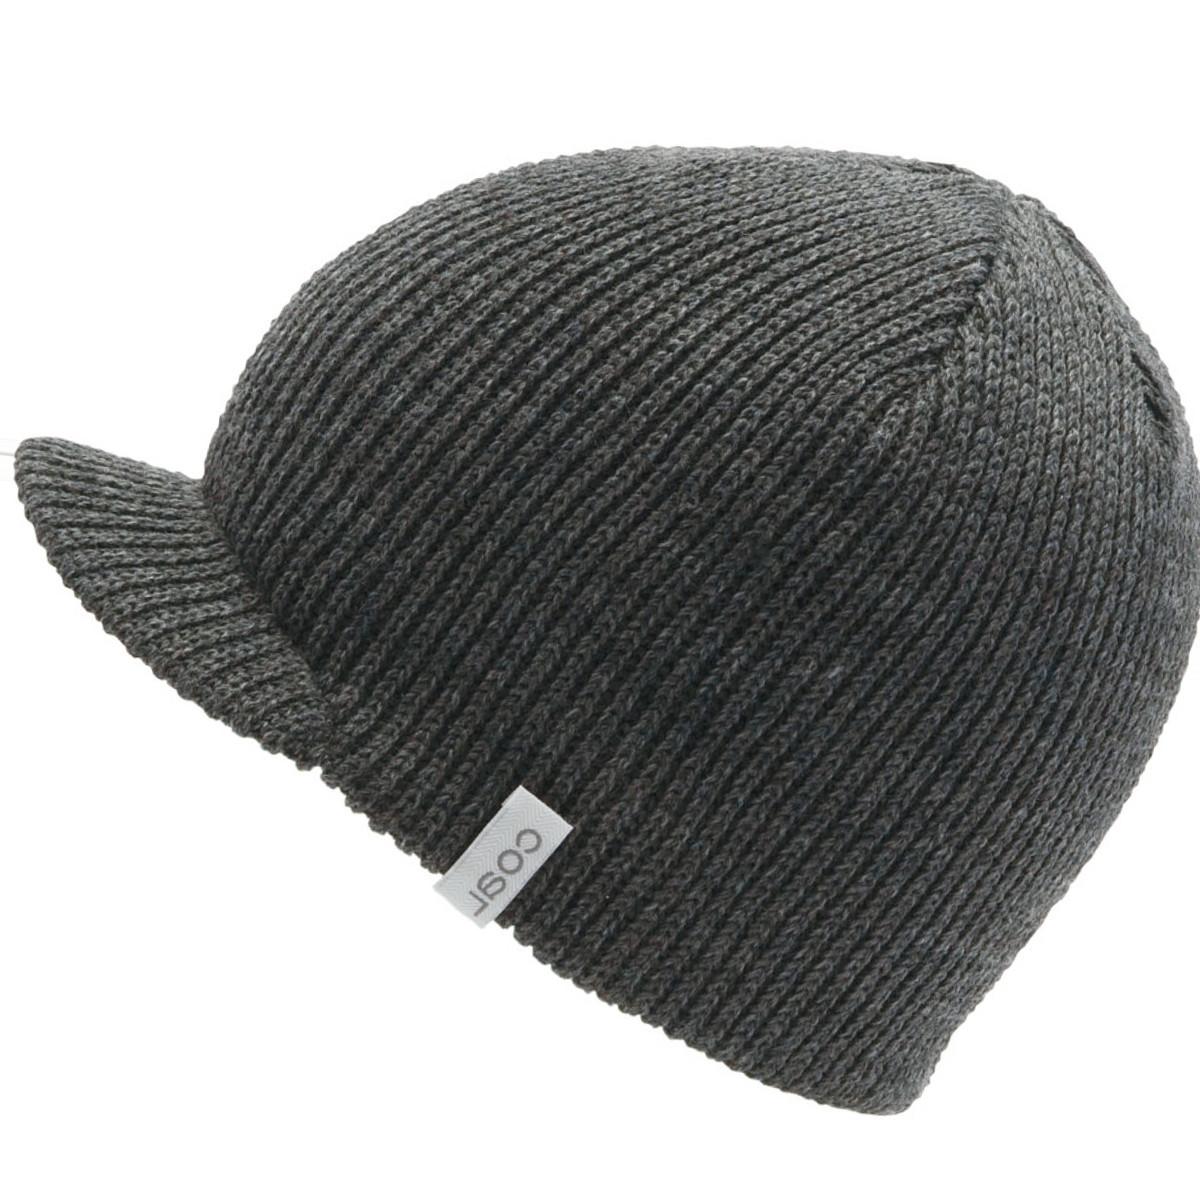 Coal Headwear Basic Visor Beanie - Women's